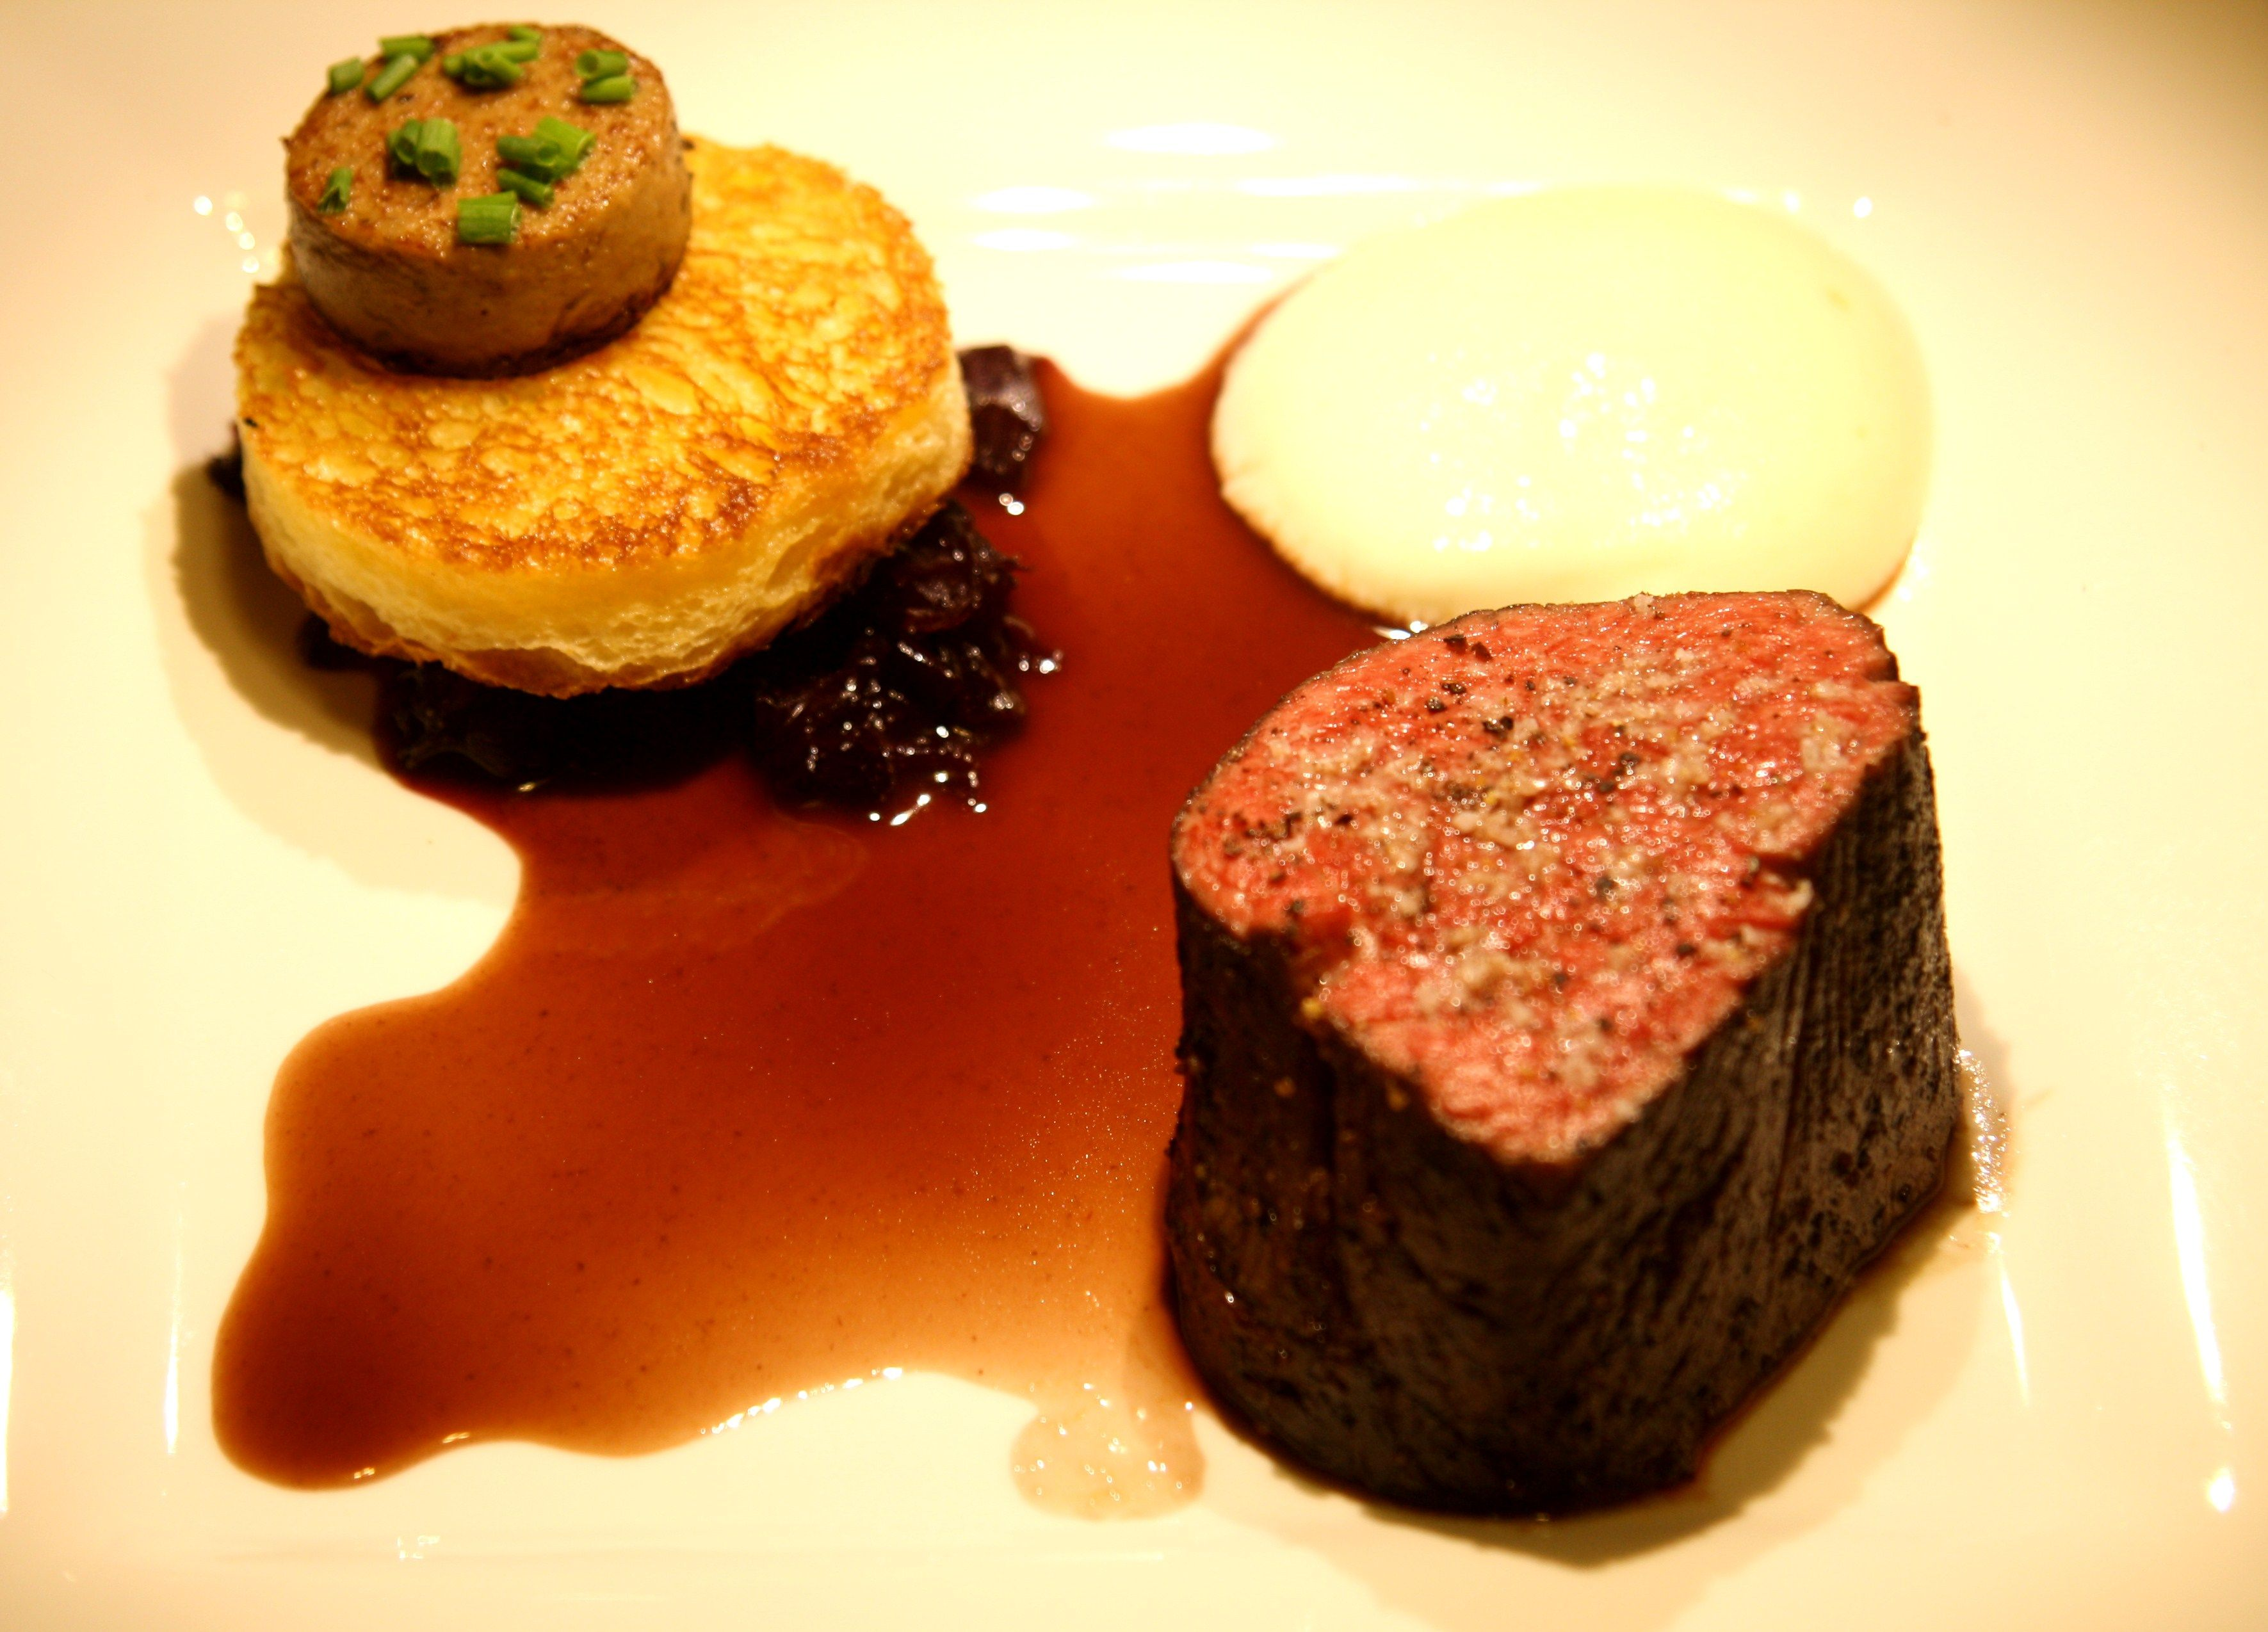 Beef Tenderloin Red Wine Braised Onions Brioche Truffle Mousse Potato Foam Bordelaise Sauce Bordelaise Sauce Truffle Mousse Beef Tenderloin